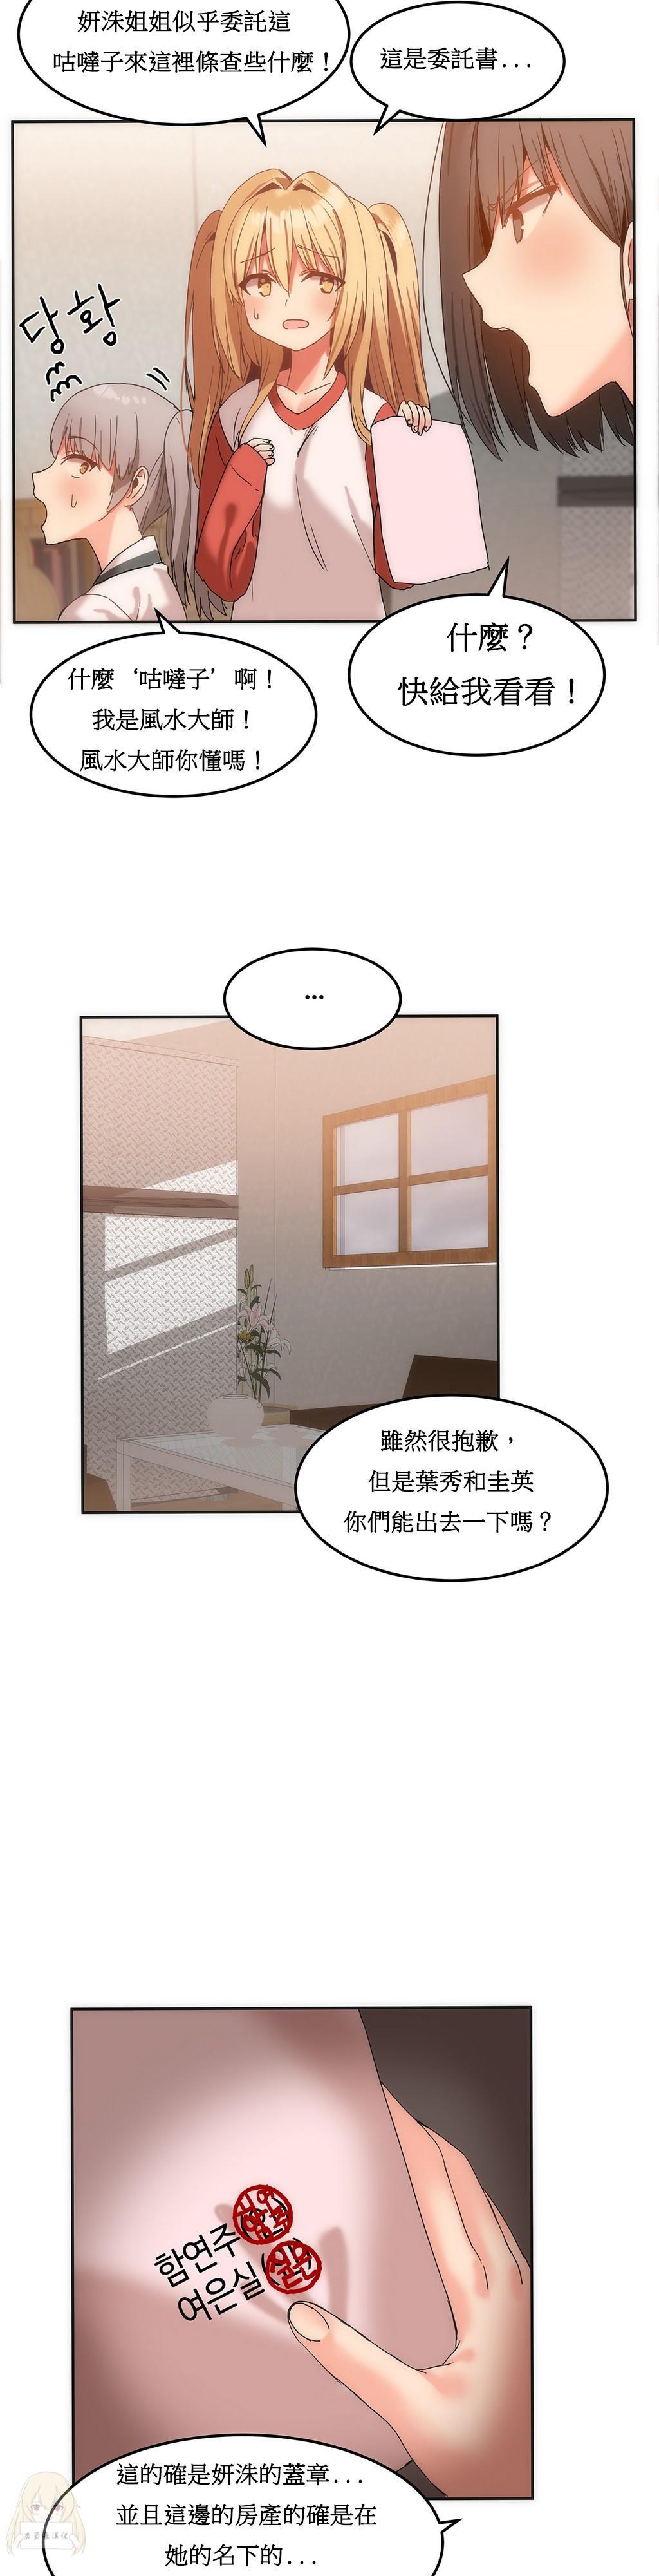 Hahri's Lumpy Boardhouse Ch. 0~32【委員長個人漢化】 308